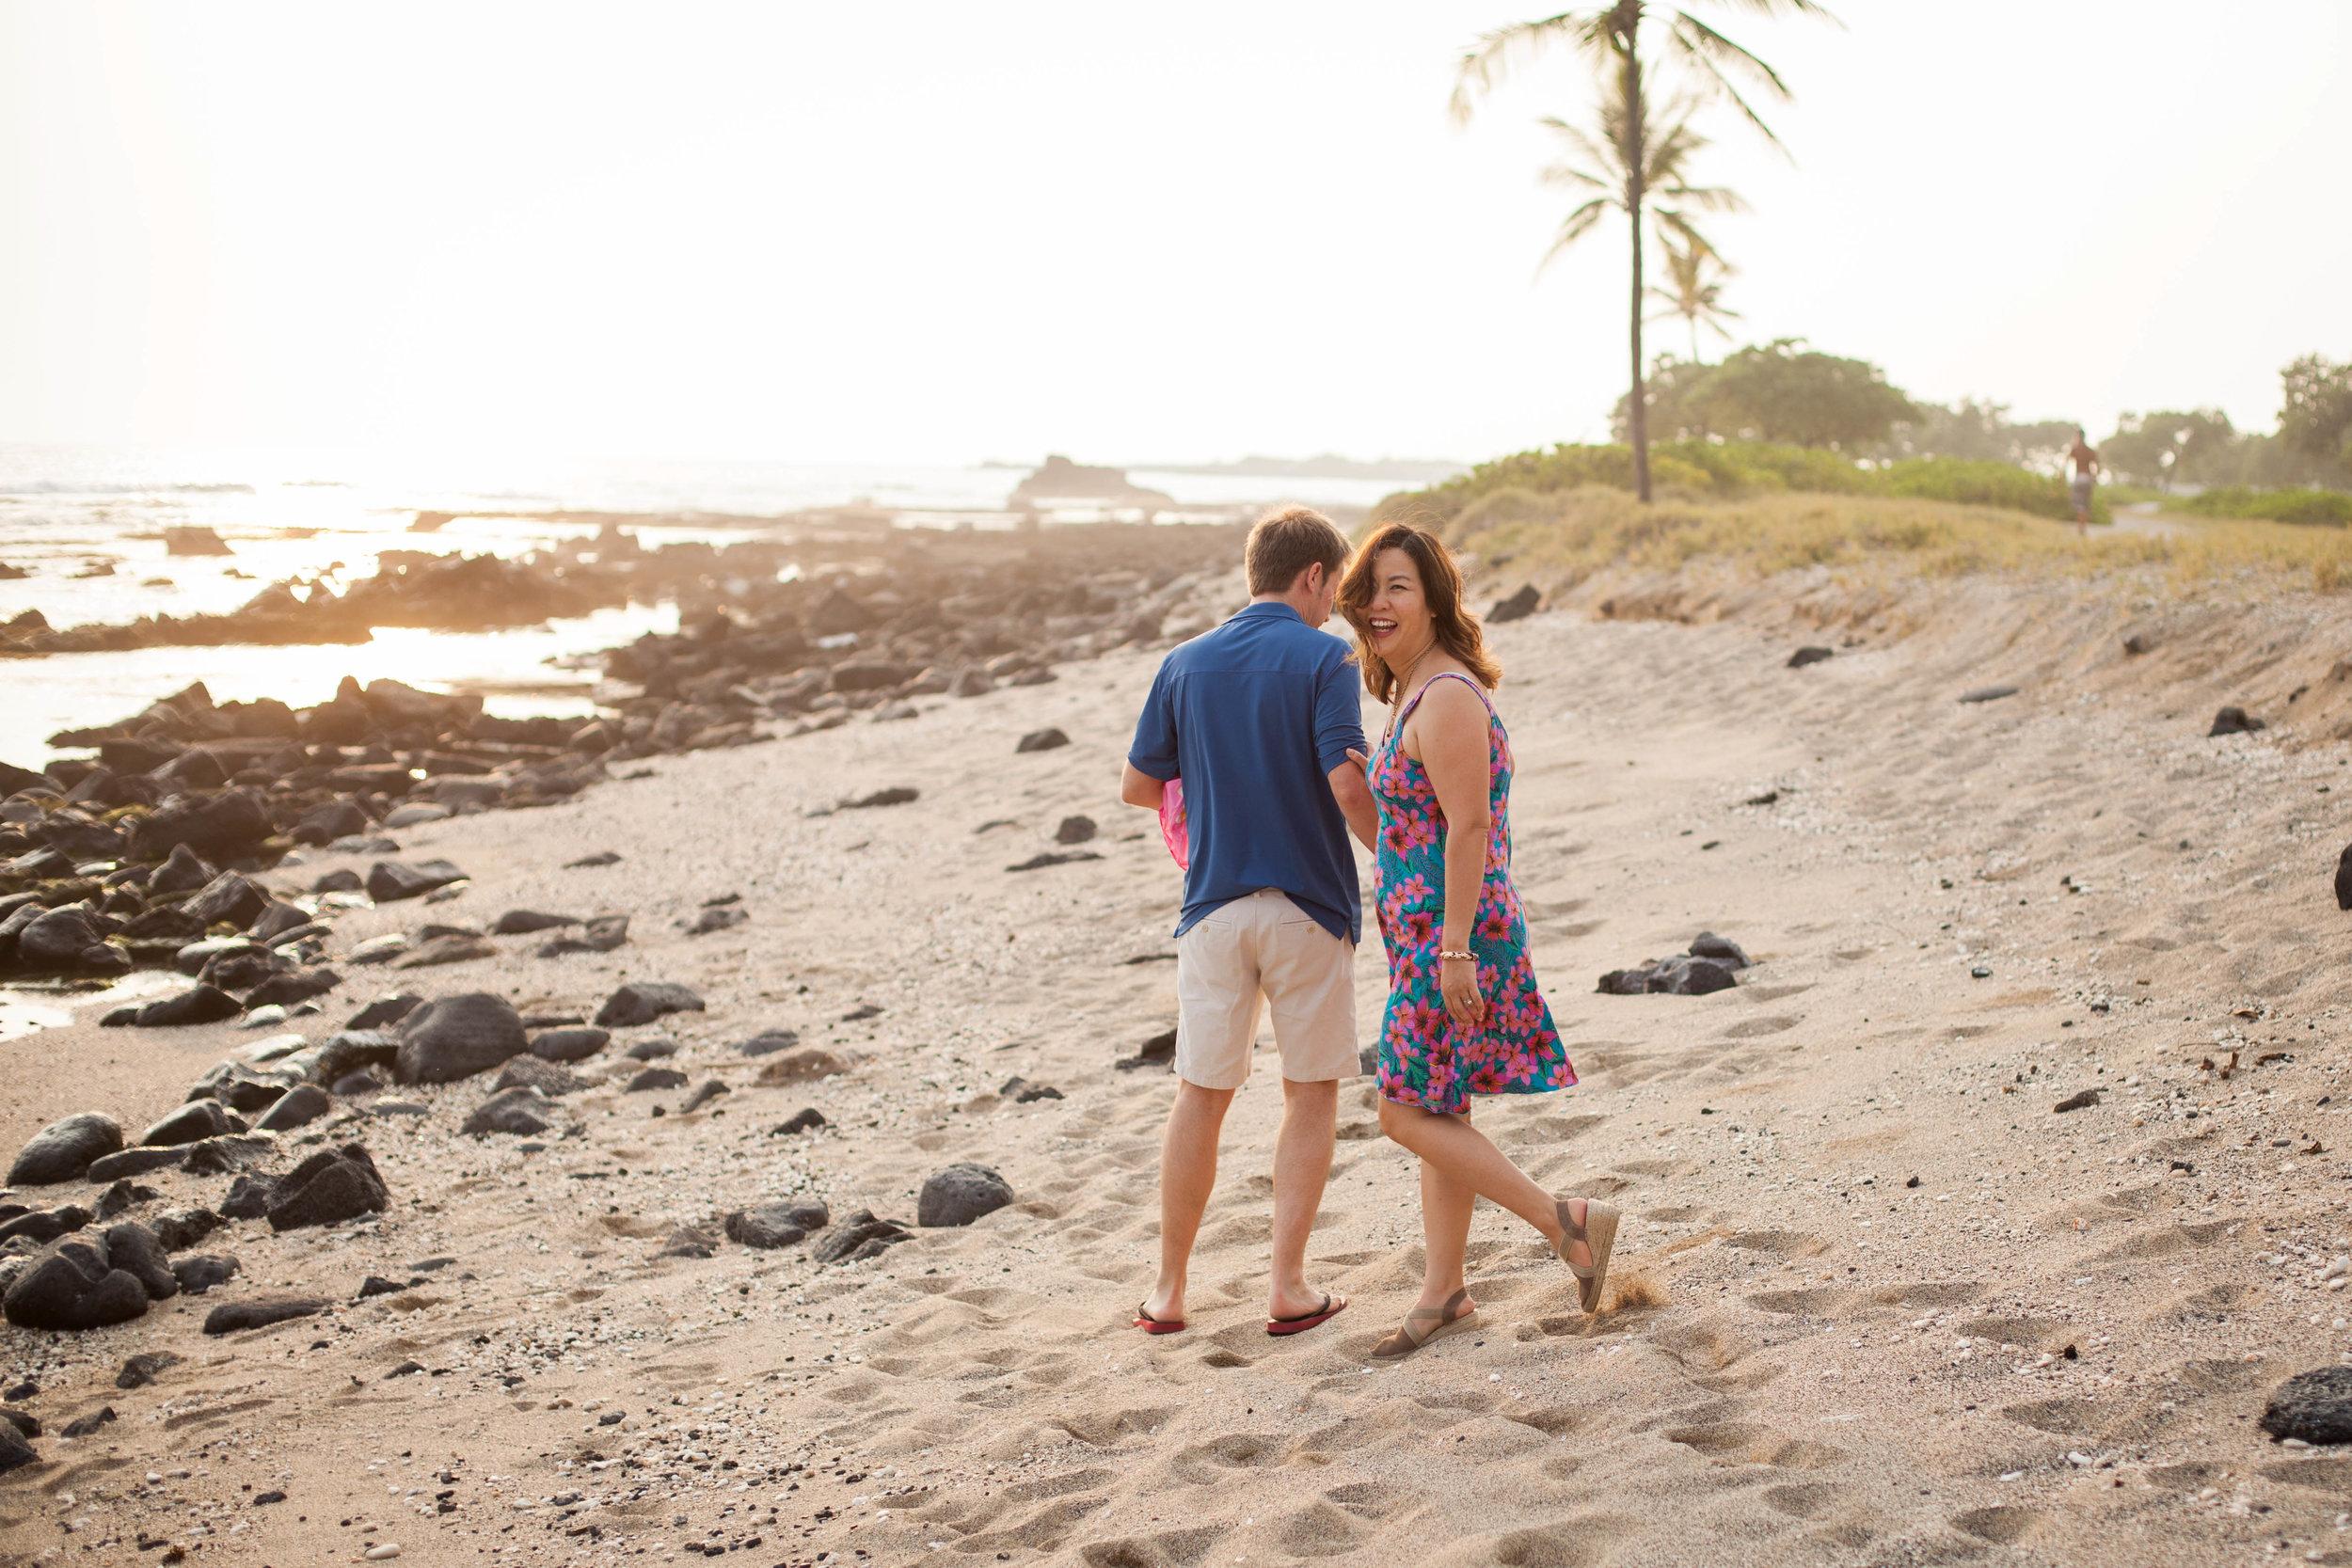 big island hawaii old kona airport beach family © kelilina photography 20170405175309.jpg